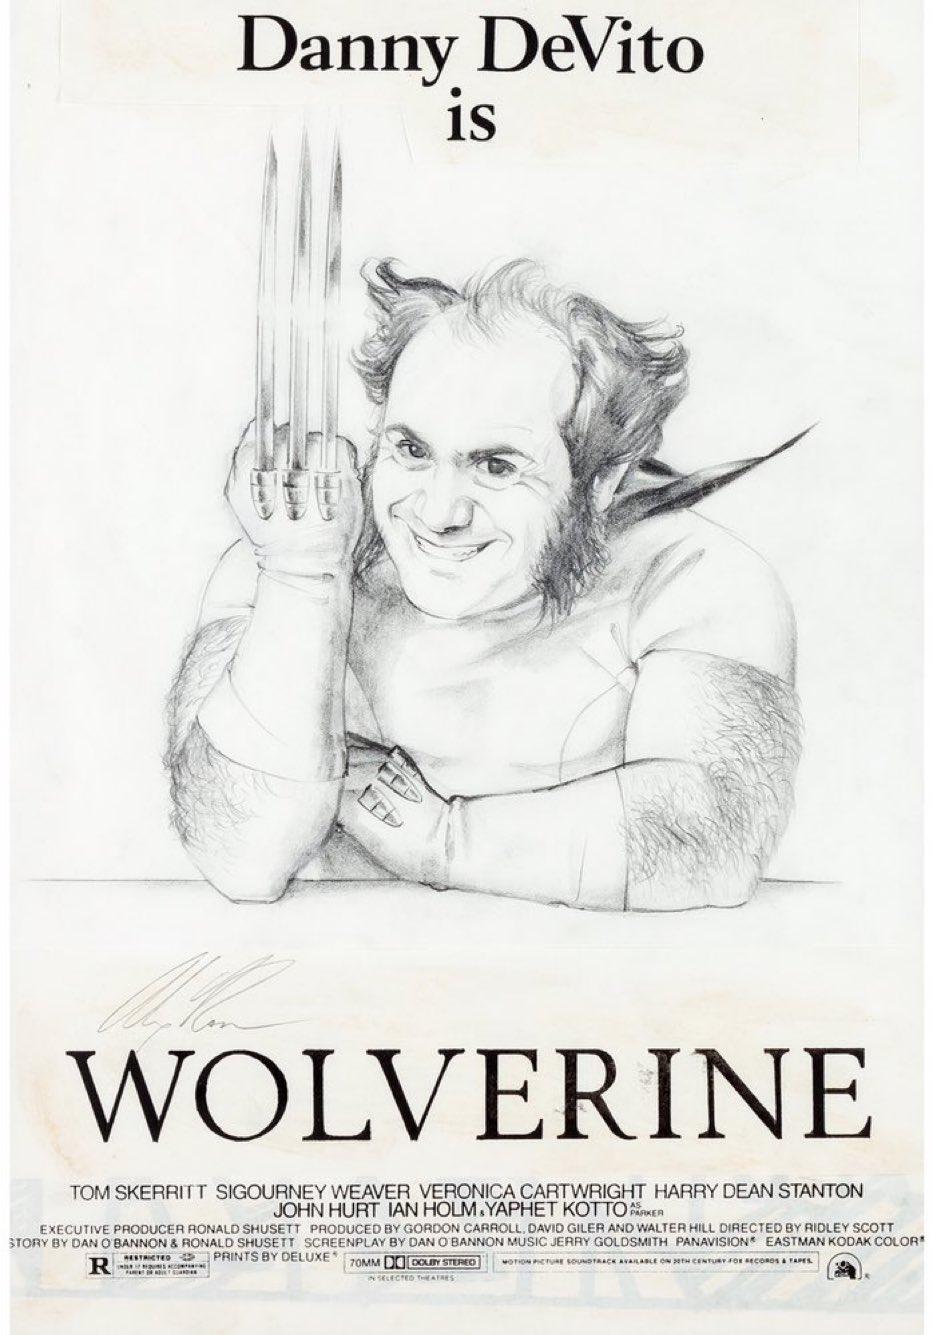 Danny DeVito Imagined As Wolverine In Alex Ross Art